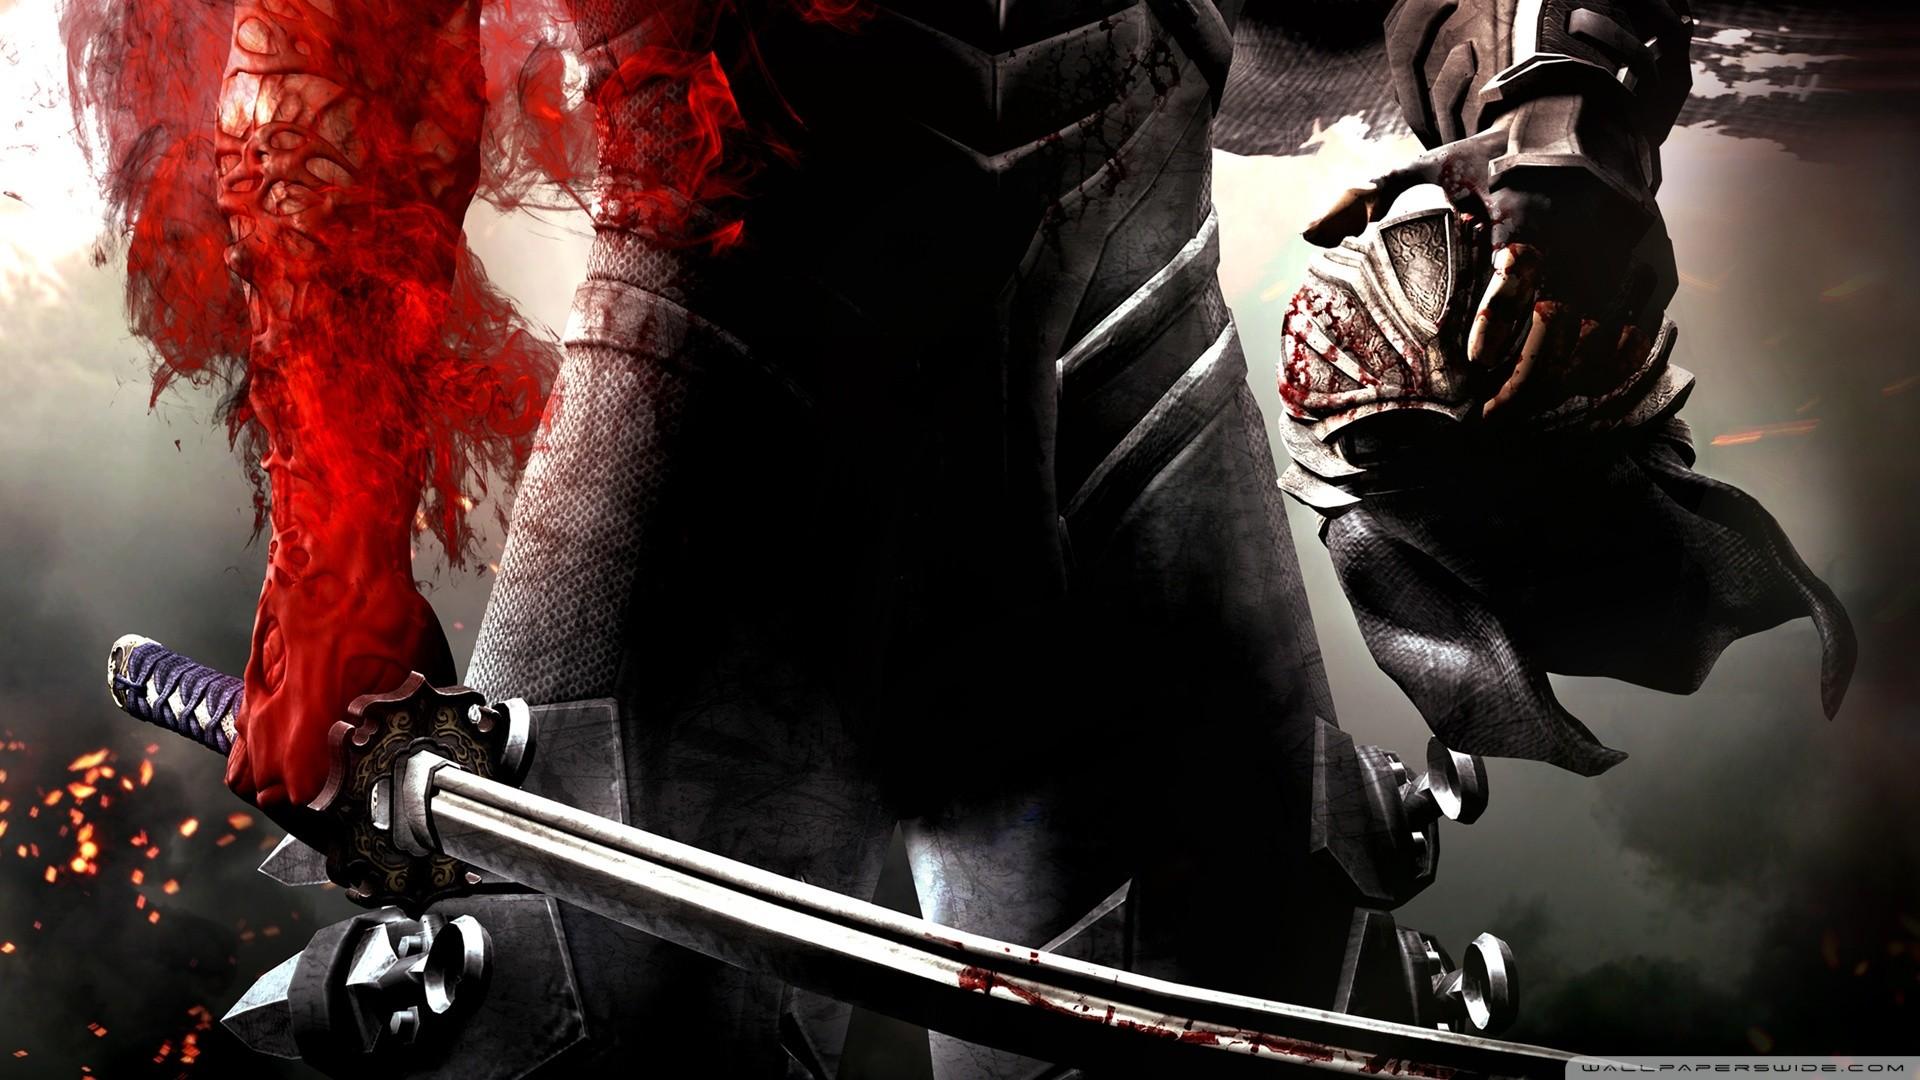 Ninja Blade PC Game Wallpaper in HD ·① WallpaperTag